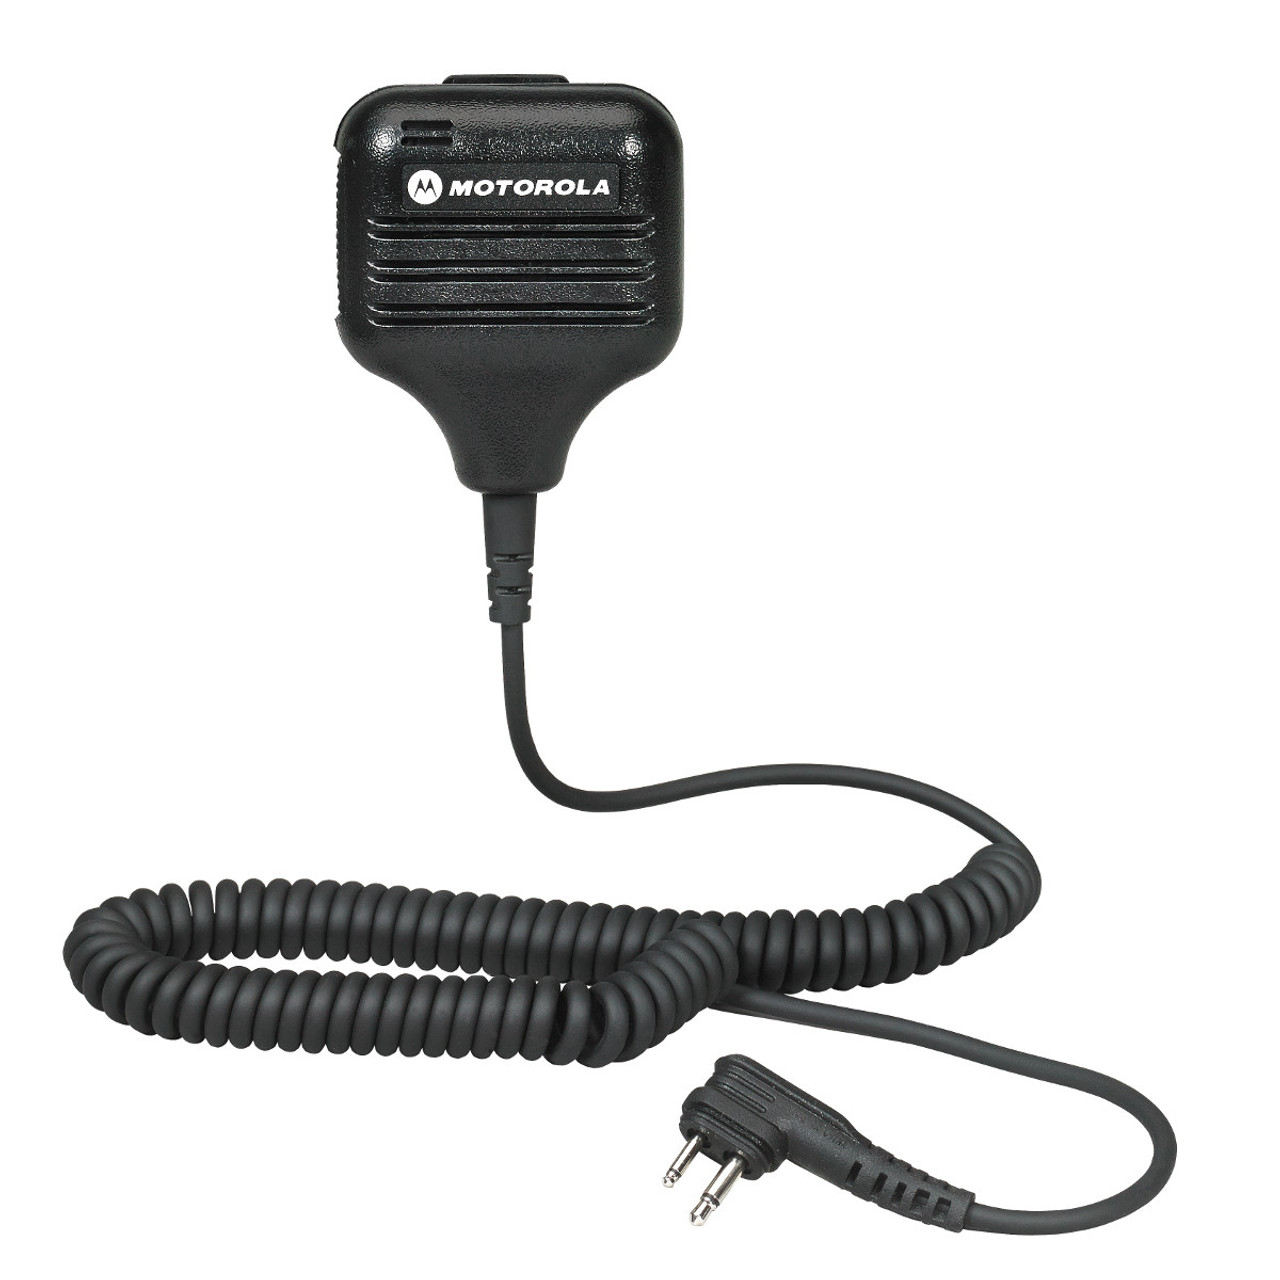 Motorola HKLN4606 53862 HMN9026 Speaker Mics for RMU2040 RMU2080D Radios Qty 5